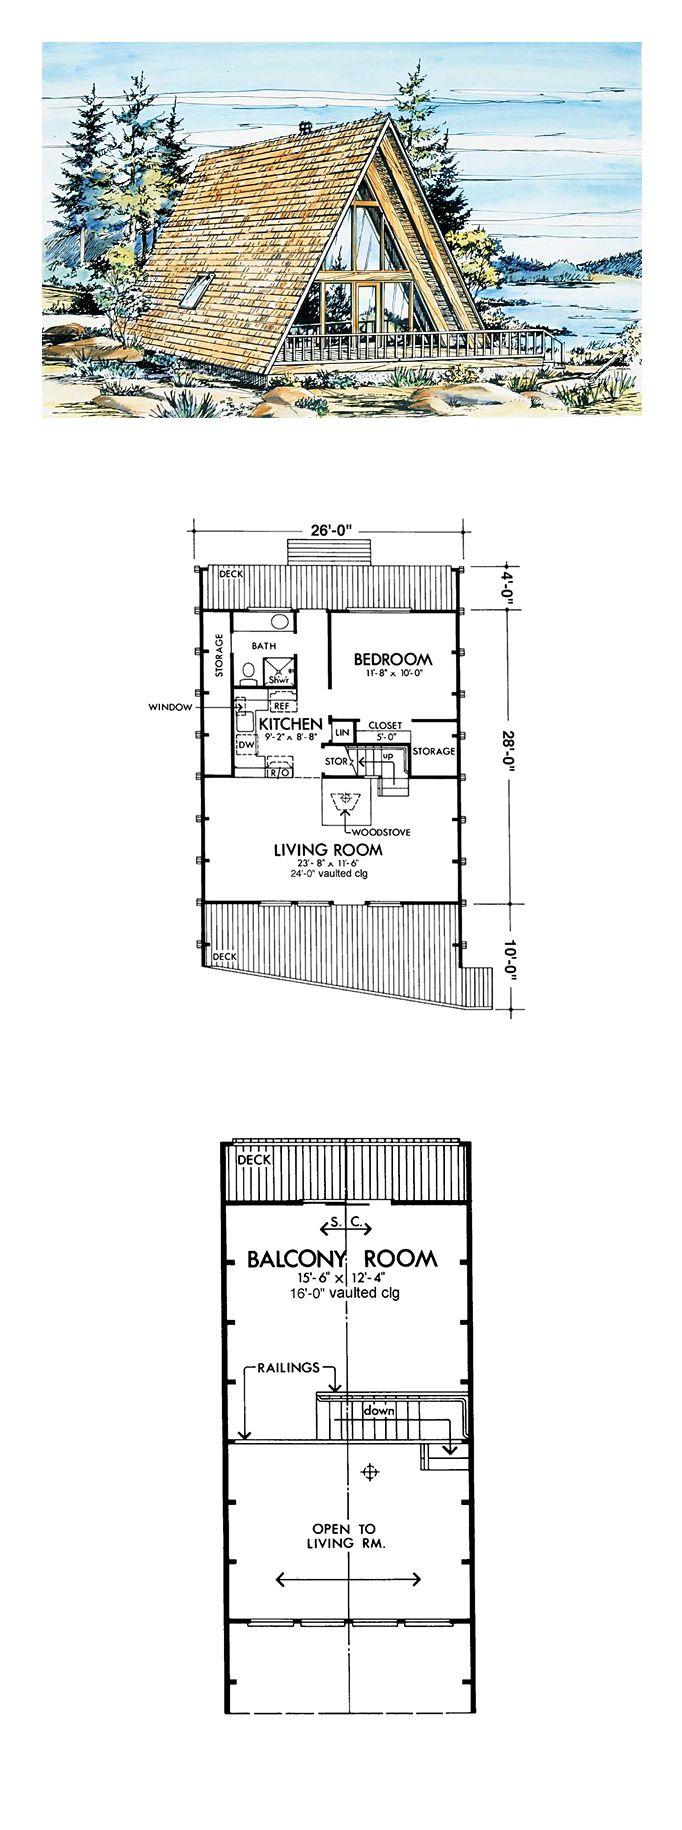 best 25 a frame house plans ideas on pinterest a frame floor a frame style cool house plan id chp 40551 total living area